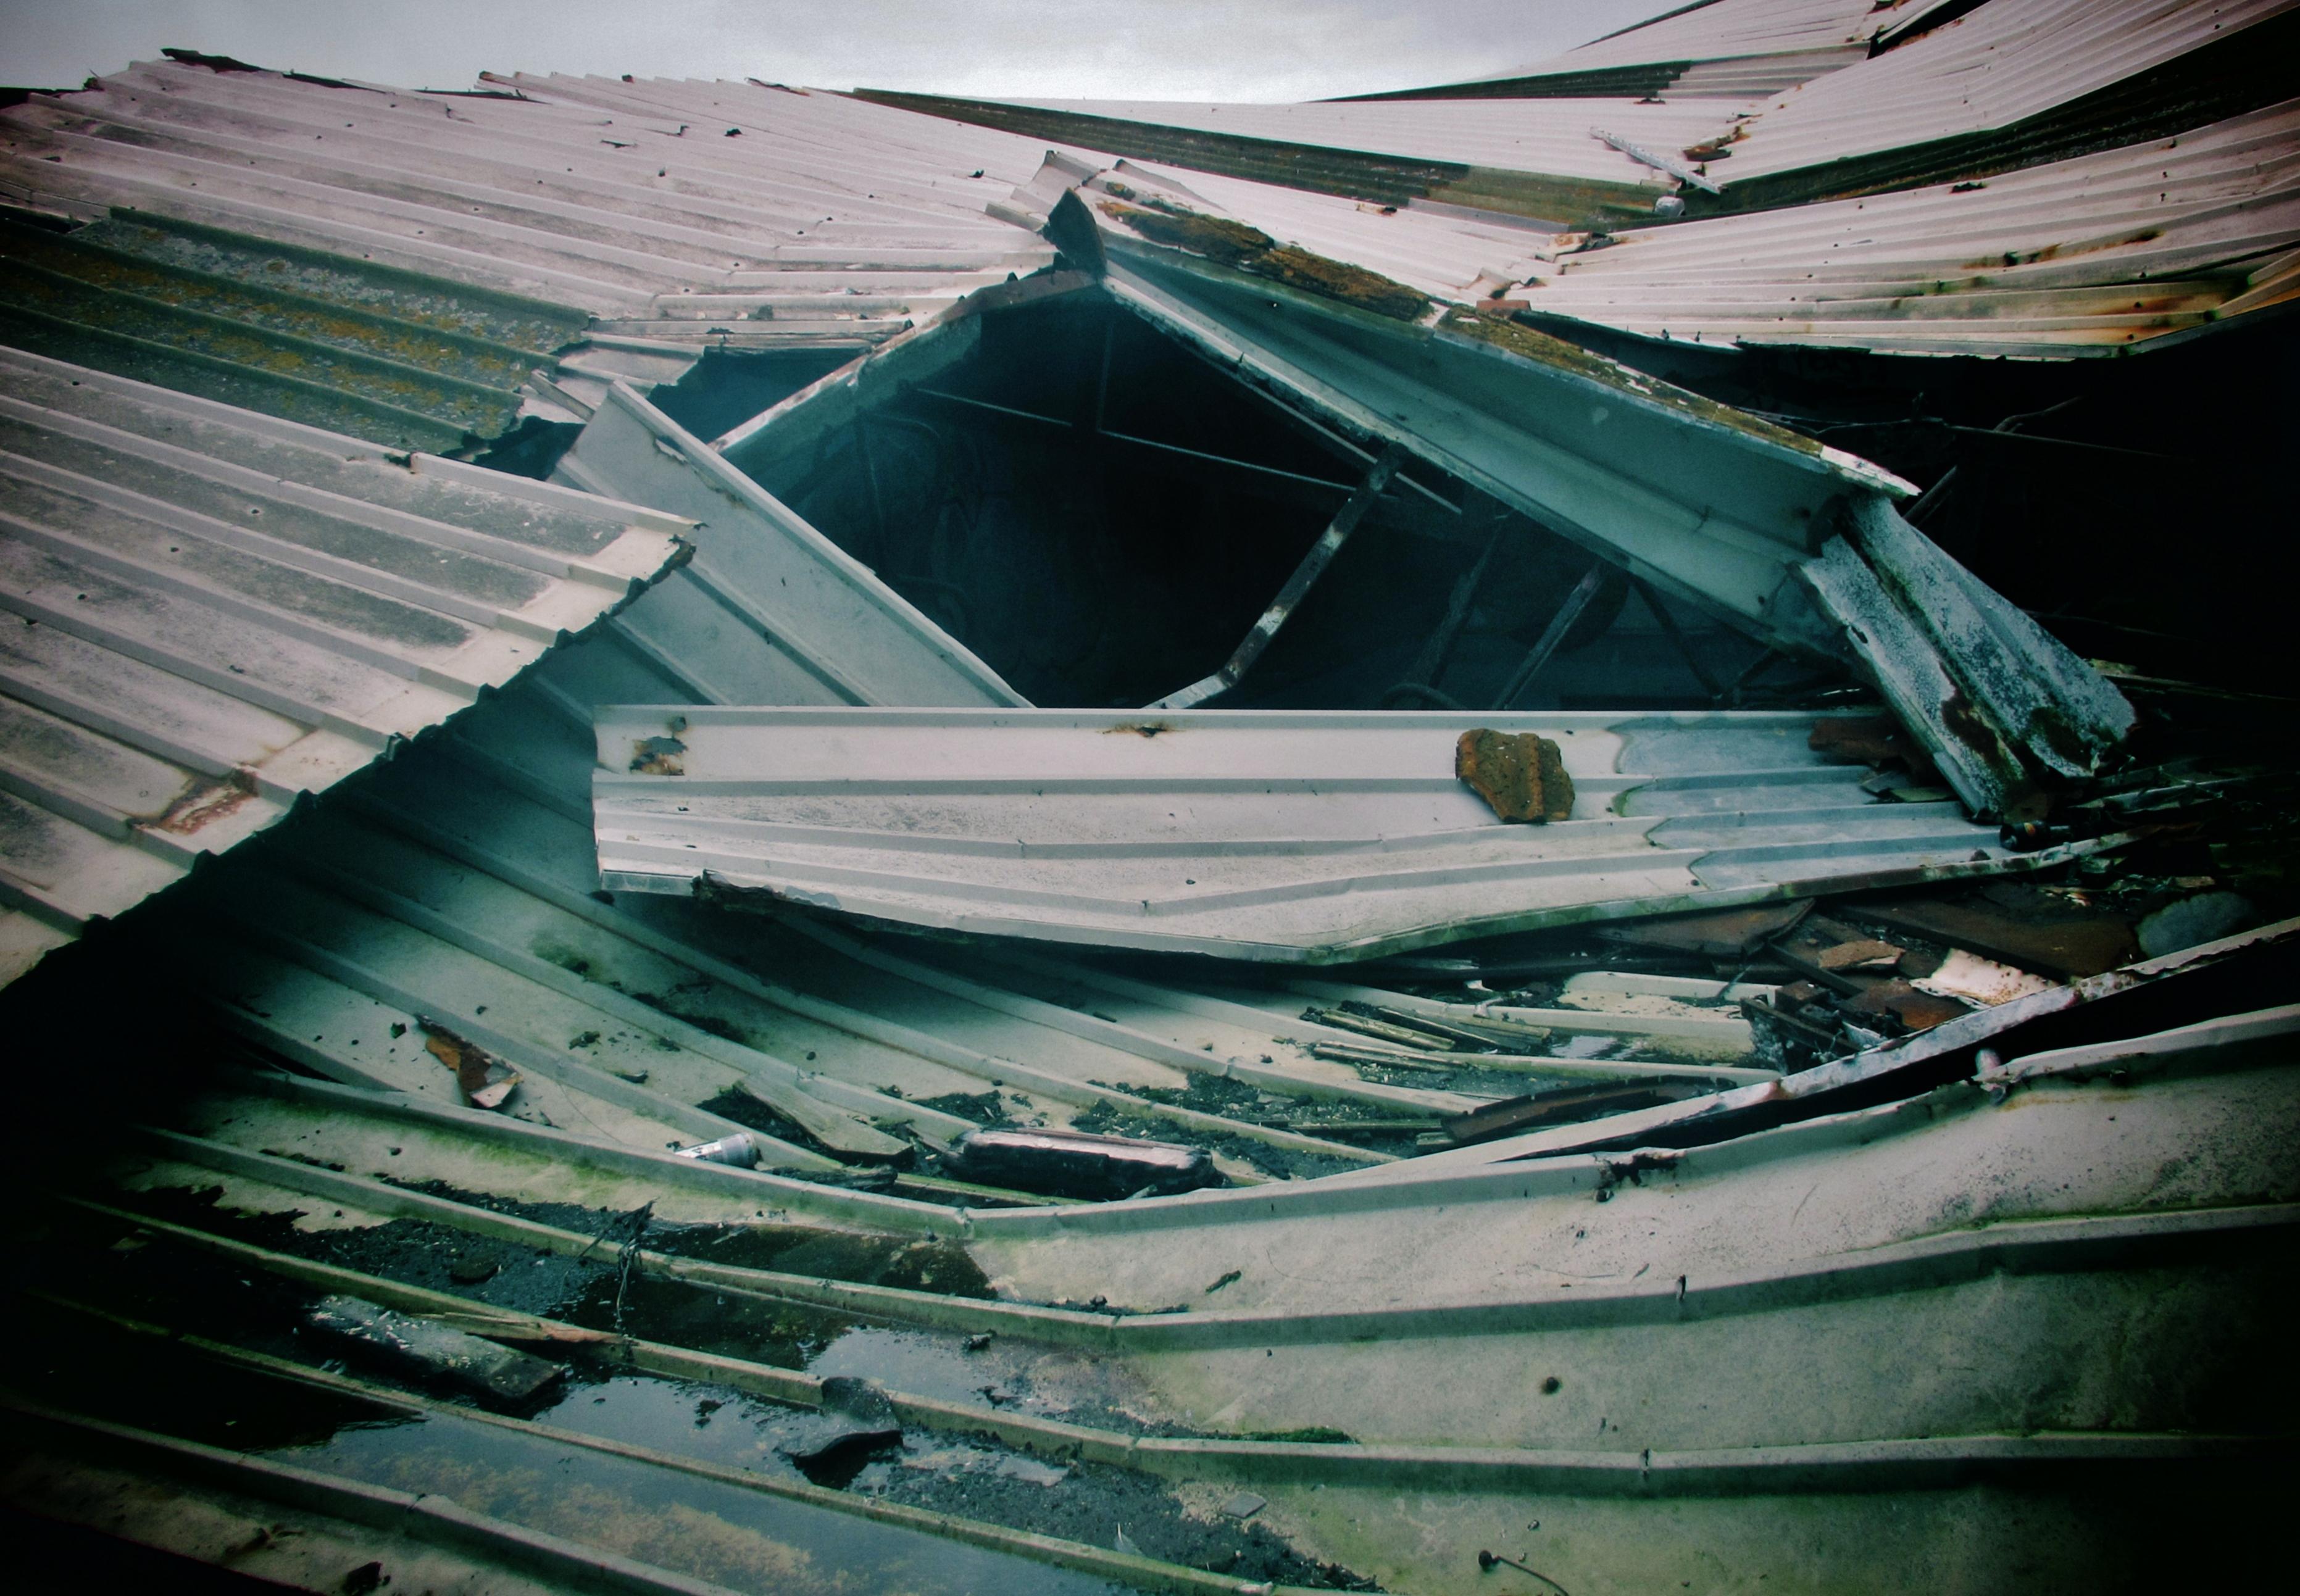 Abandoned Dun Laoghaire Baths, Dublin (Ireland) - Derelict World Photography – Lainey Quinn